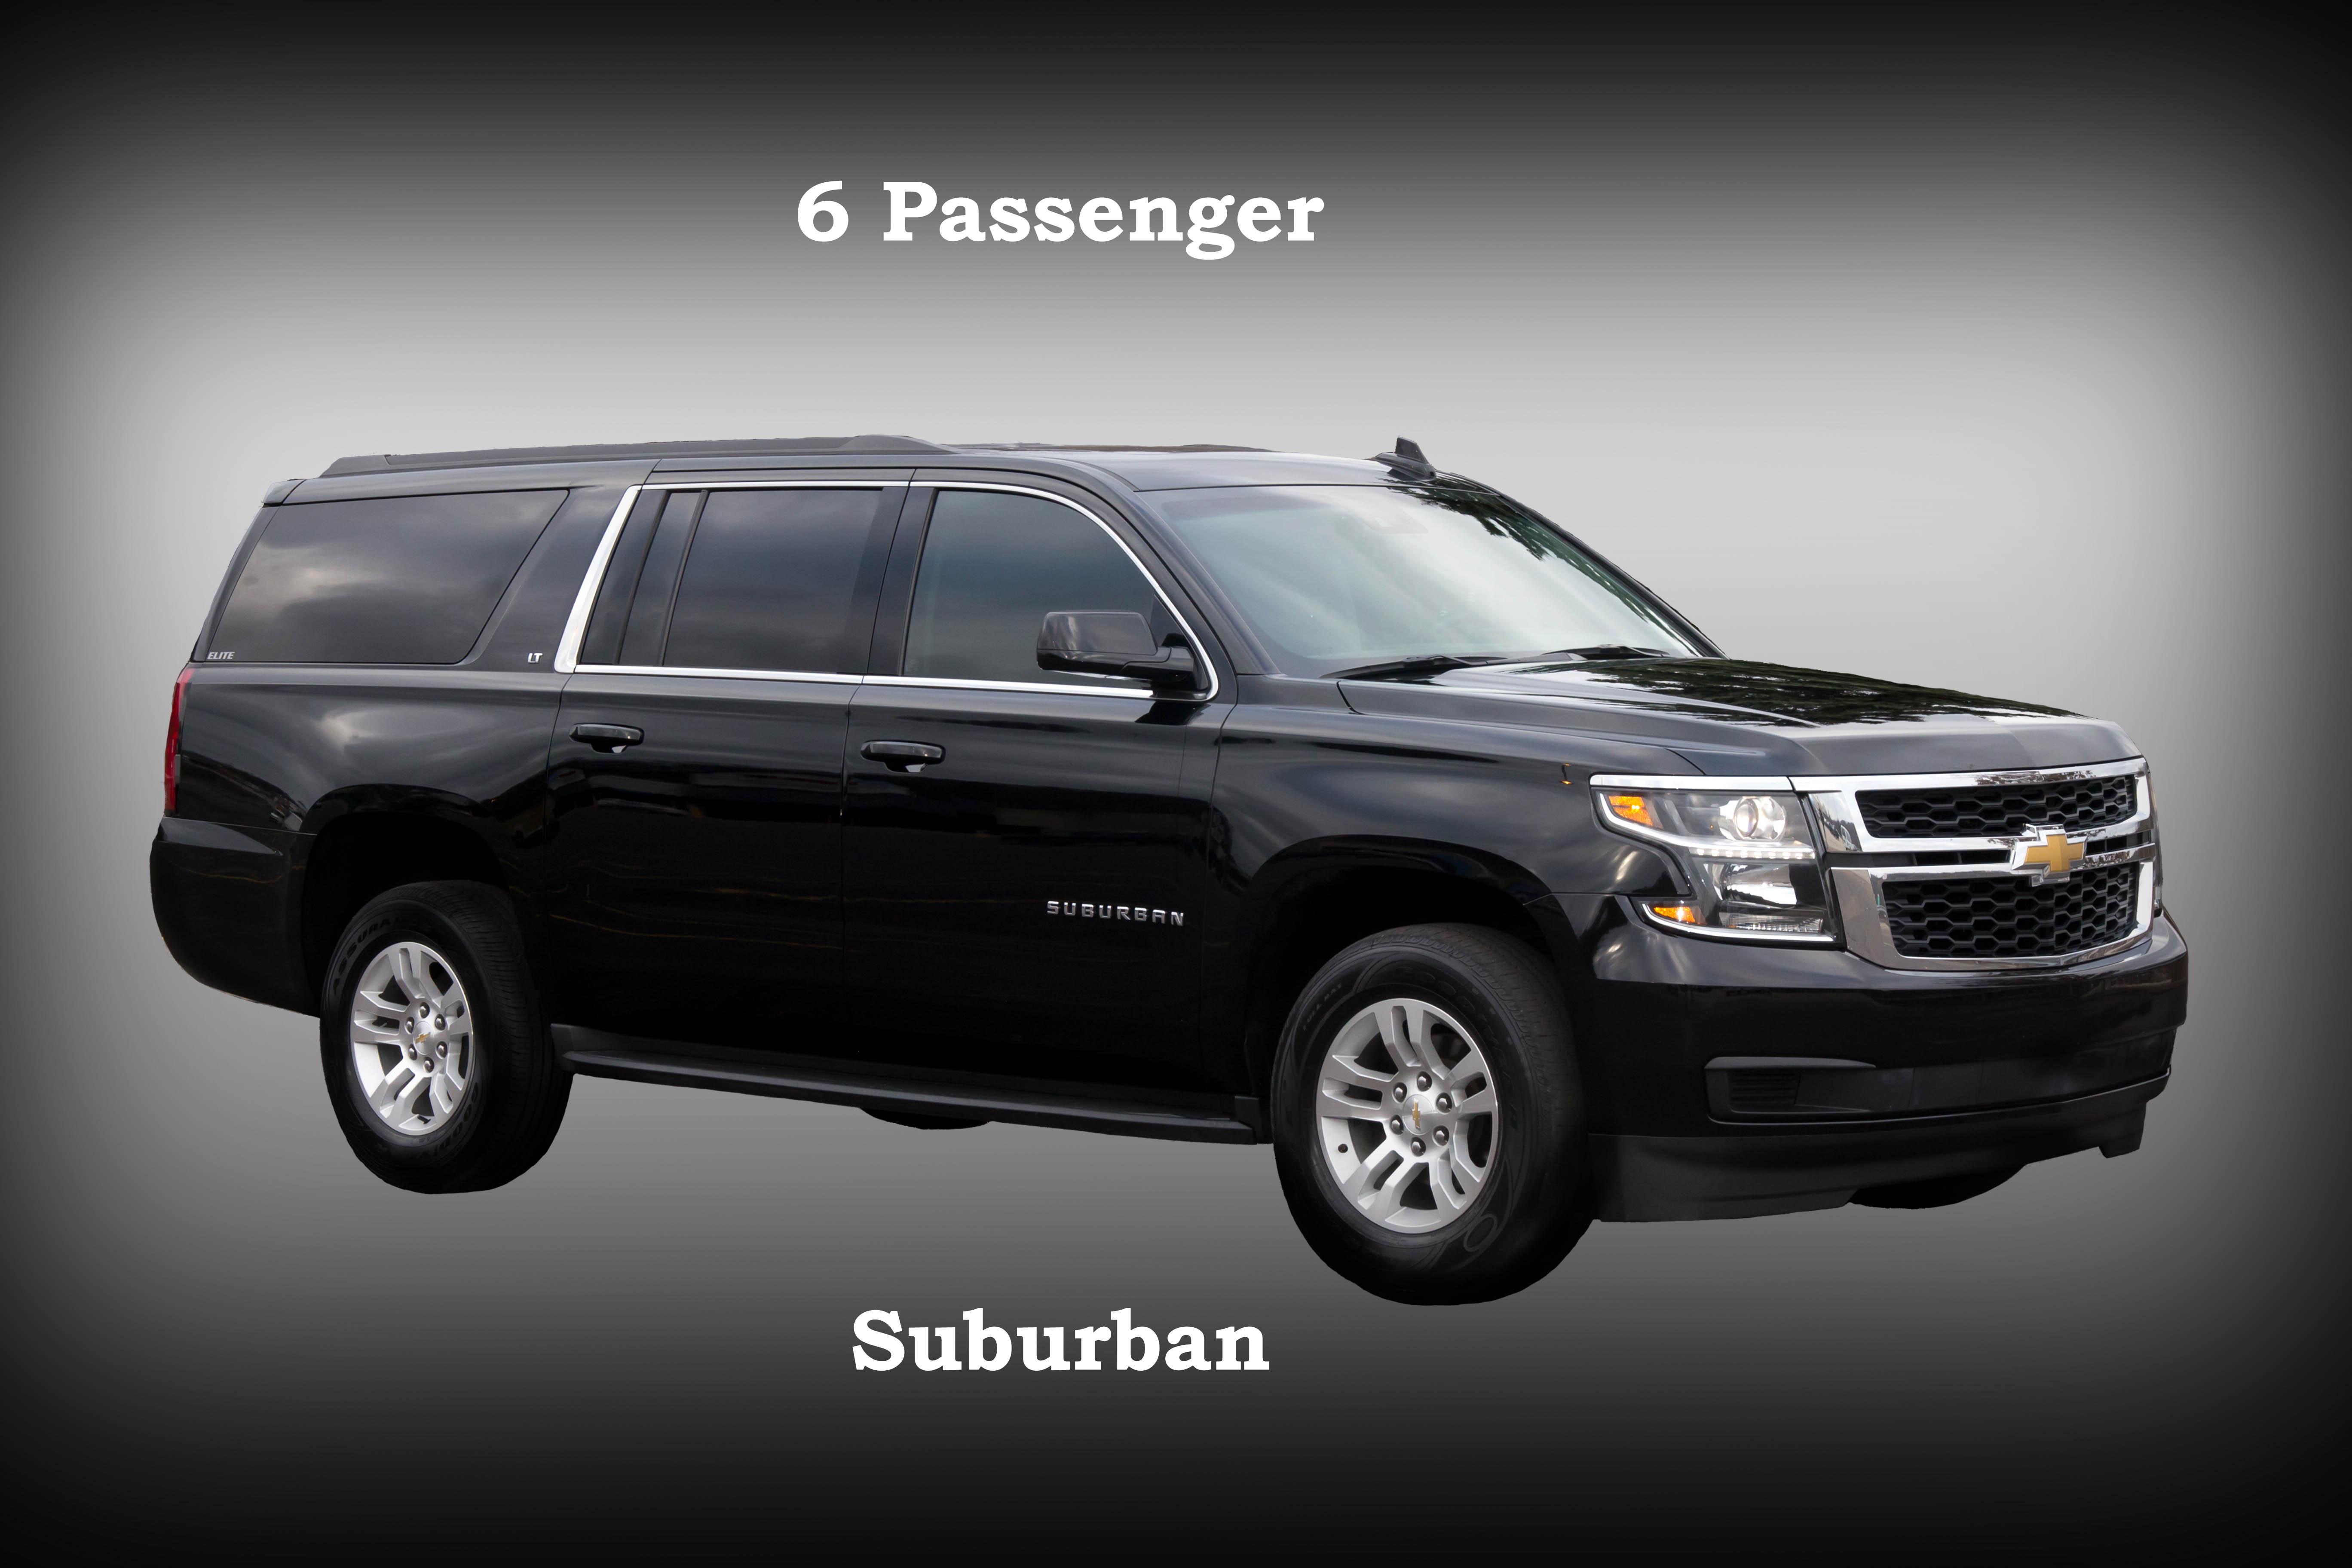 6 Passenger Suv >> Suv 7 2 6 Passenger Suburban Elite Transportationelite